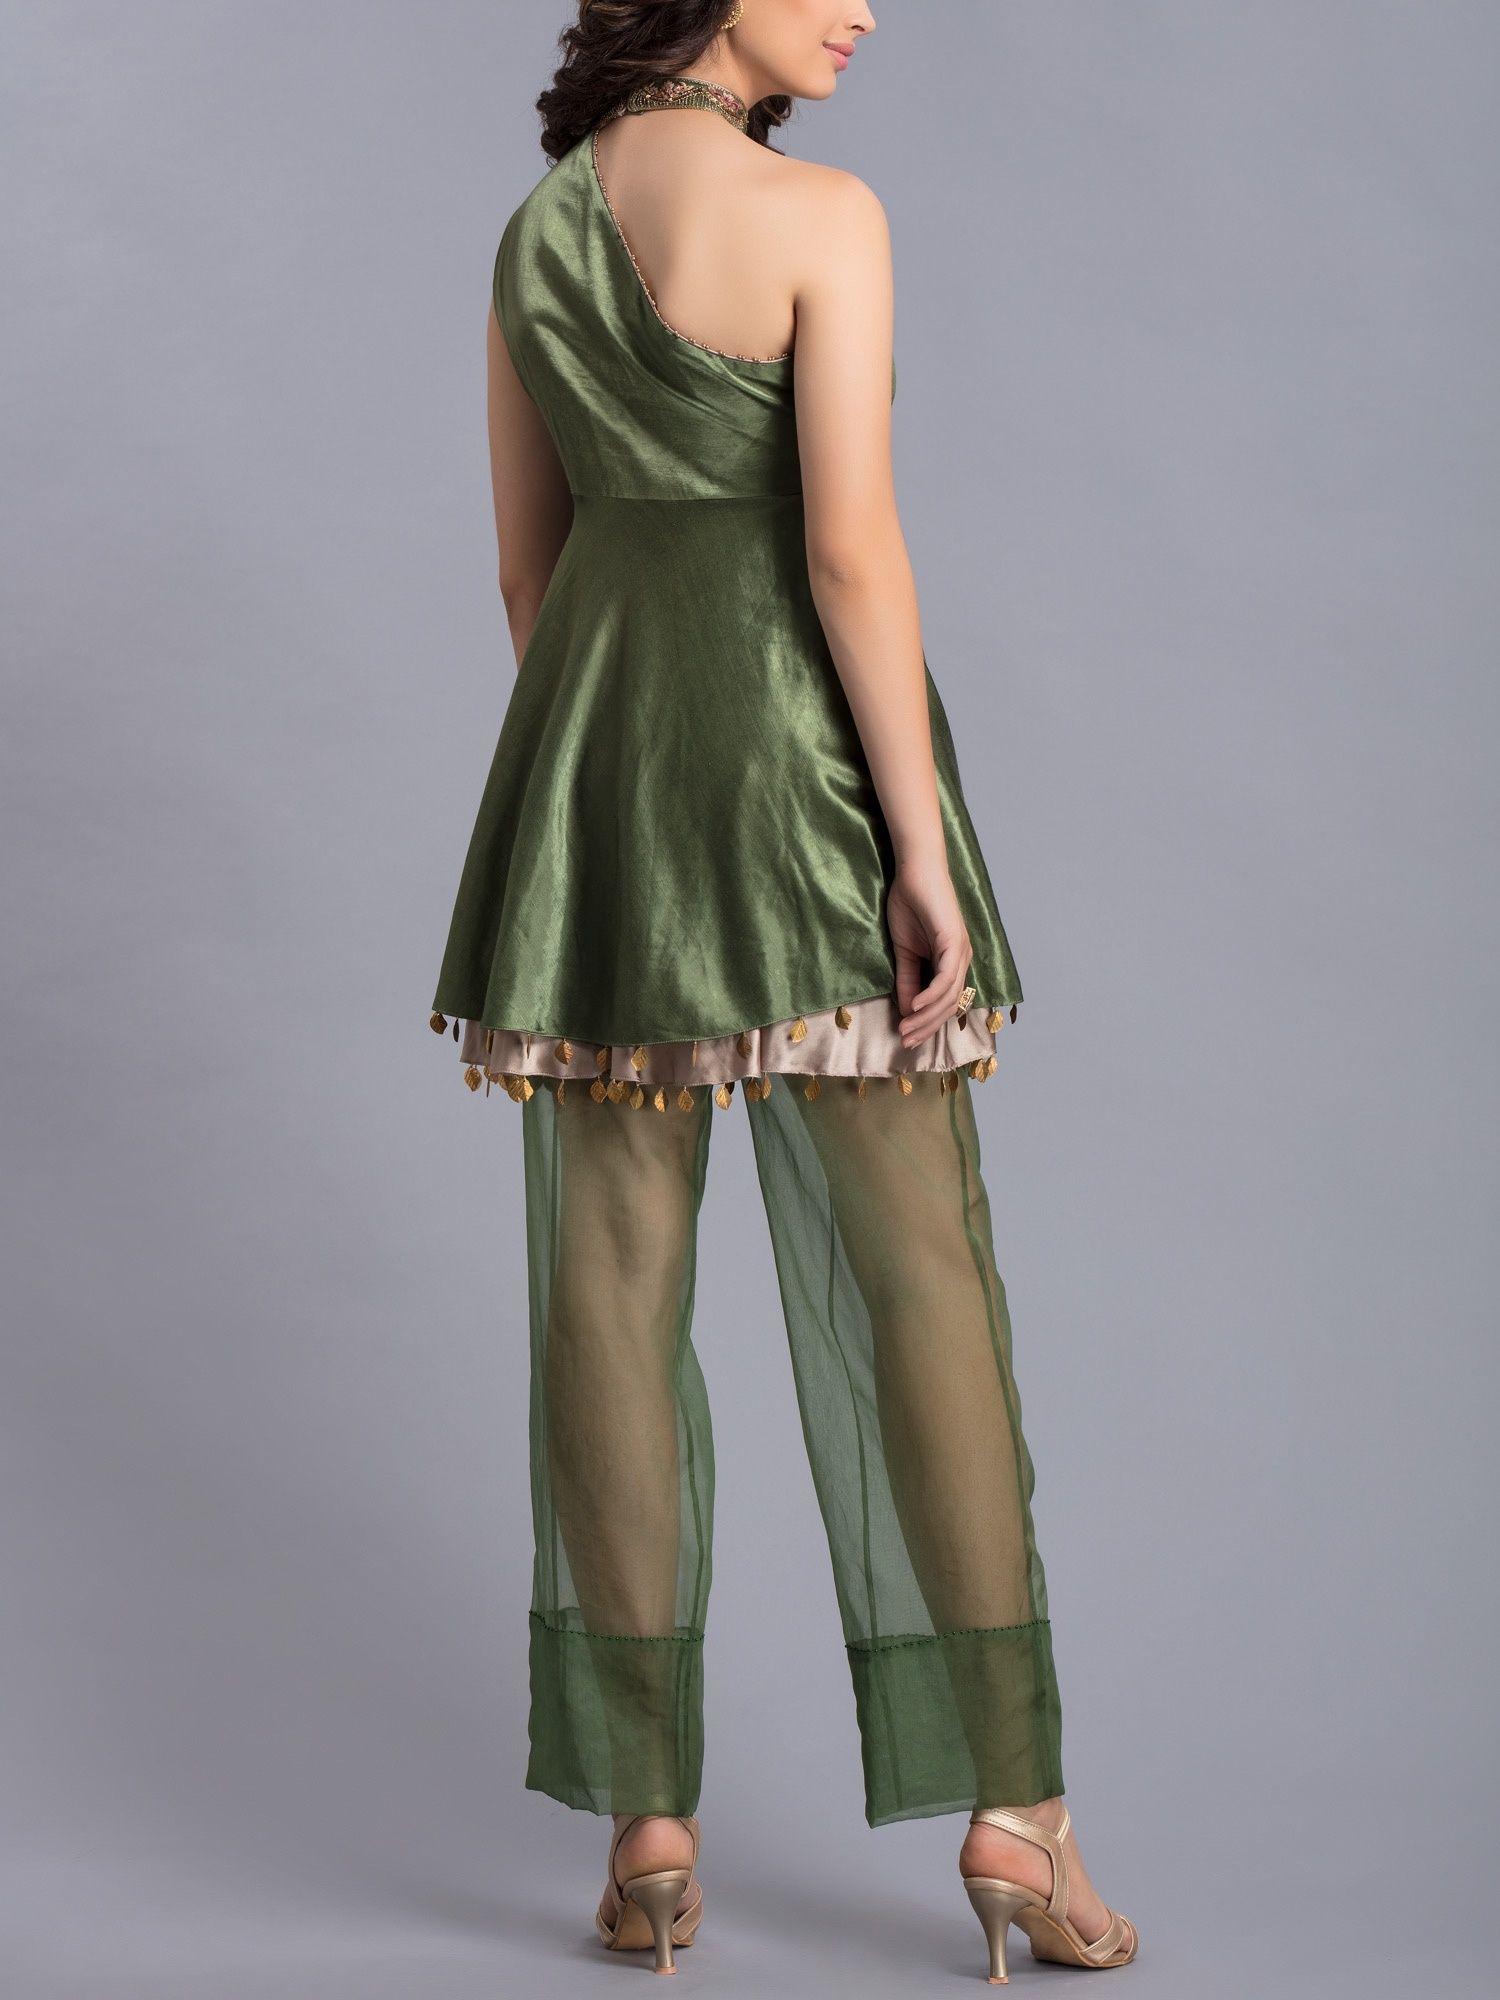 7e38193dc35 Avdi Kurtis Kurtas and Tunics : Buy Avdi Olive Green Tunic with ...